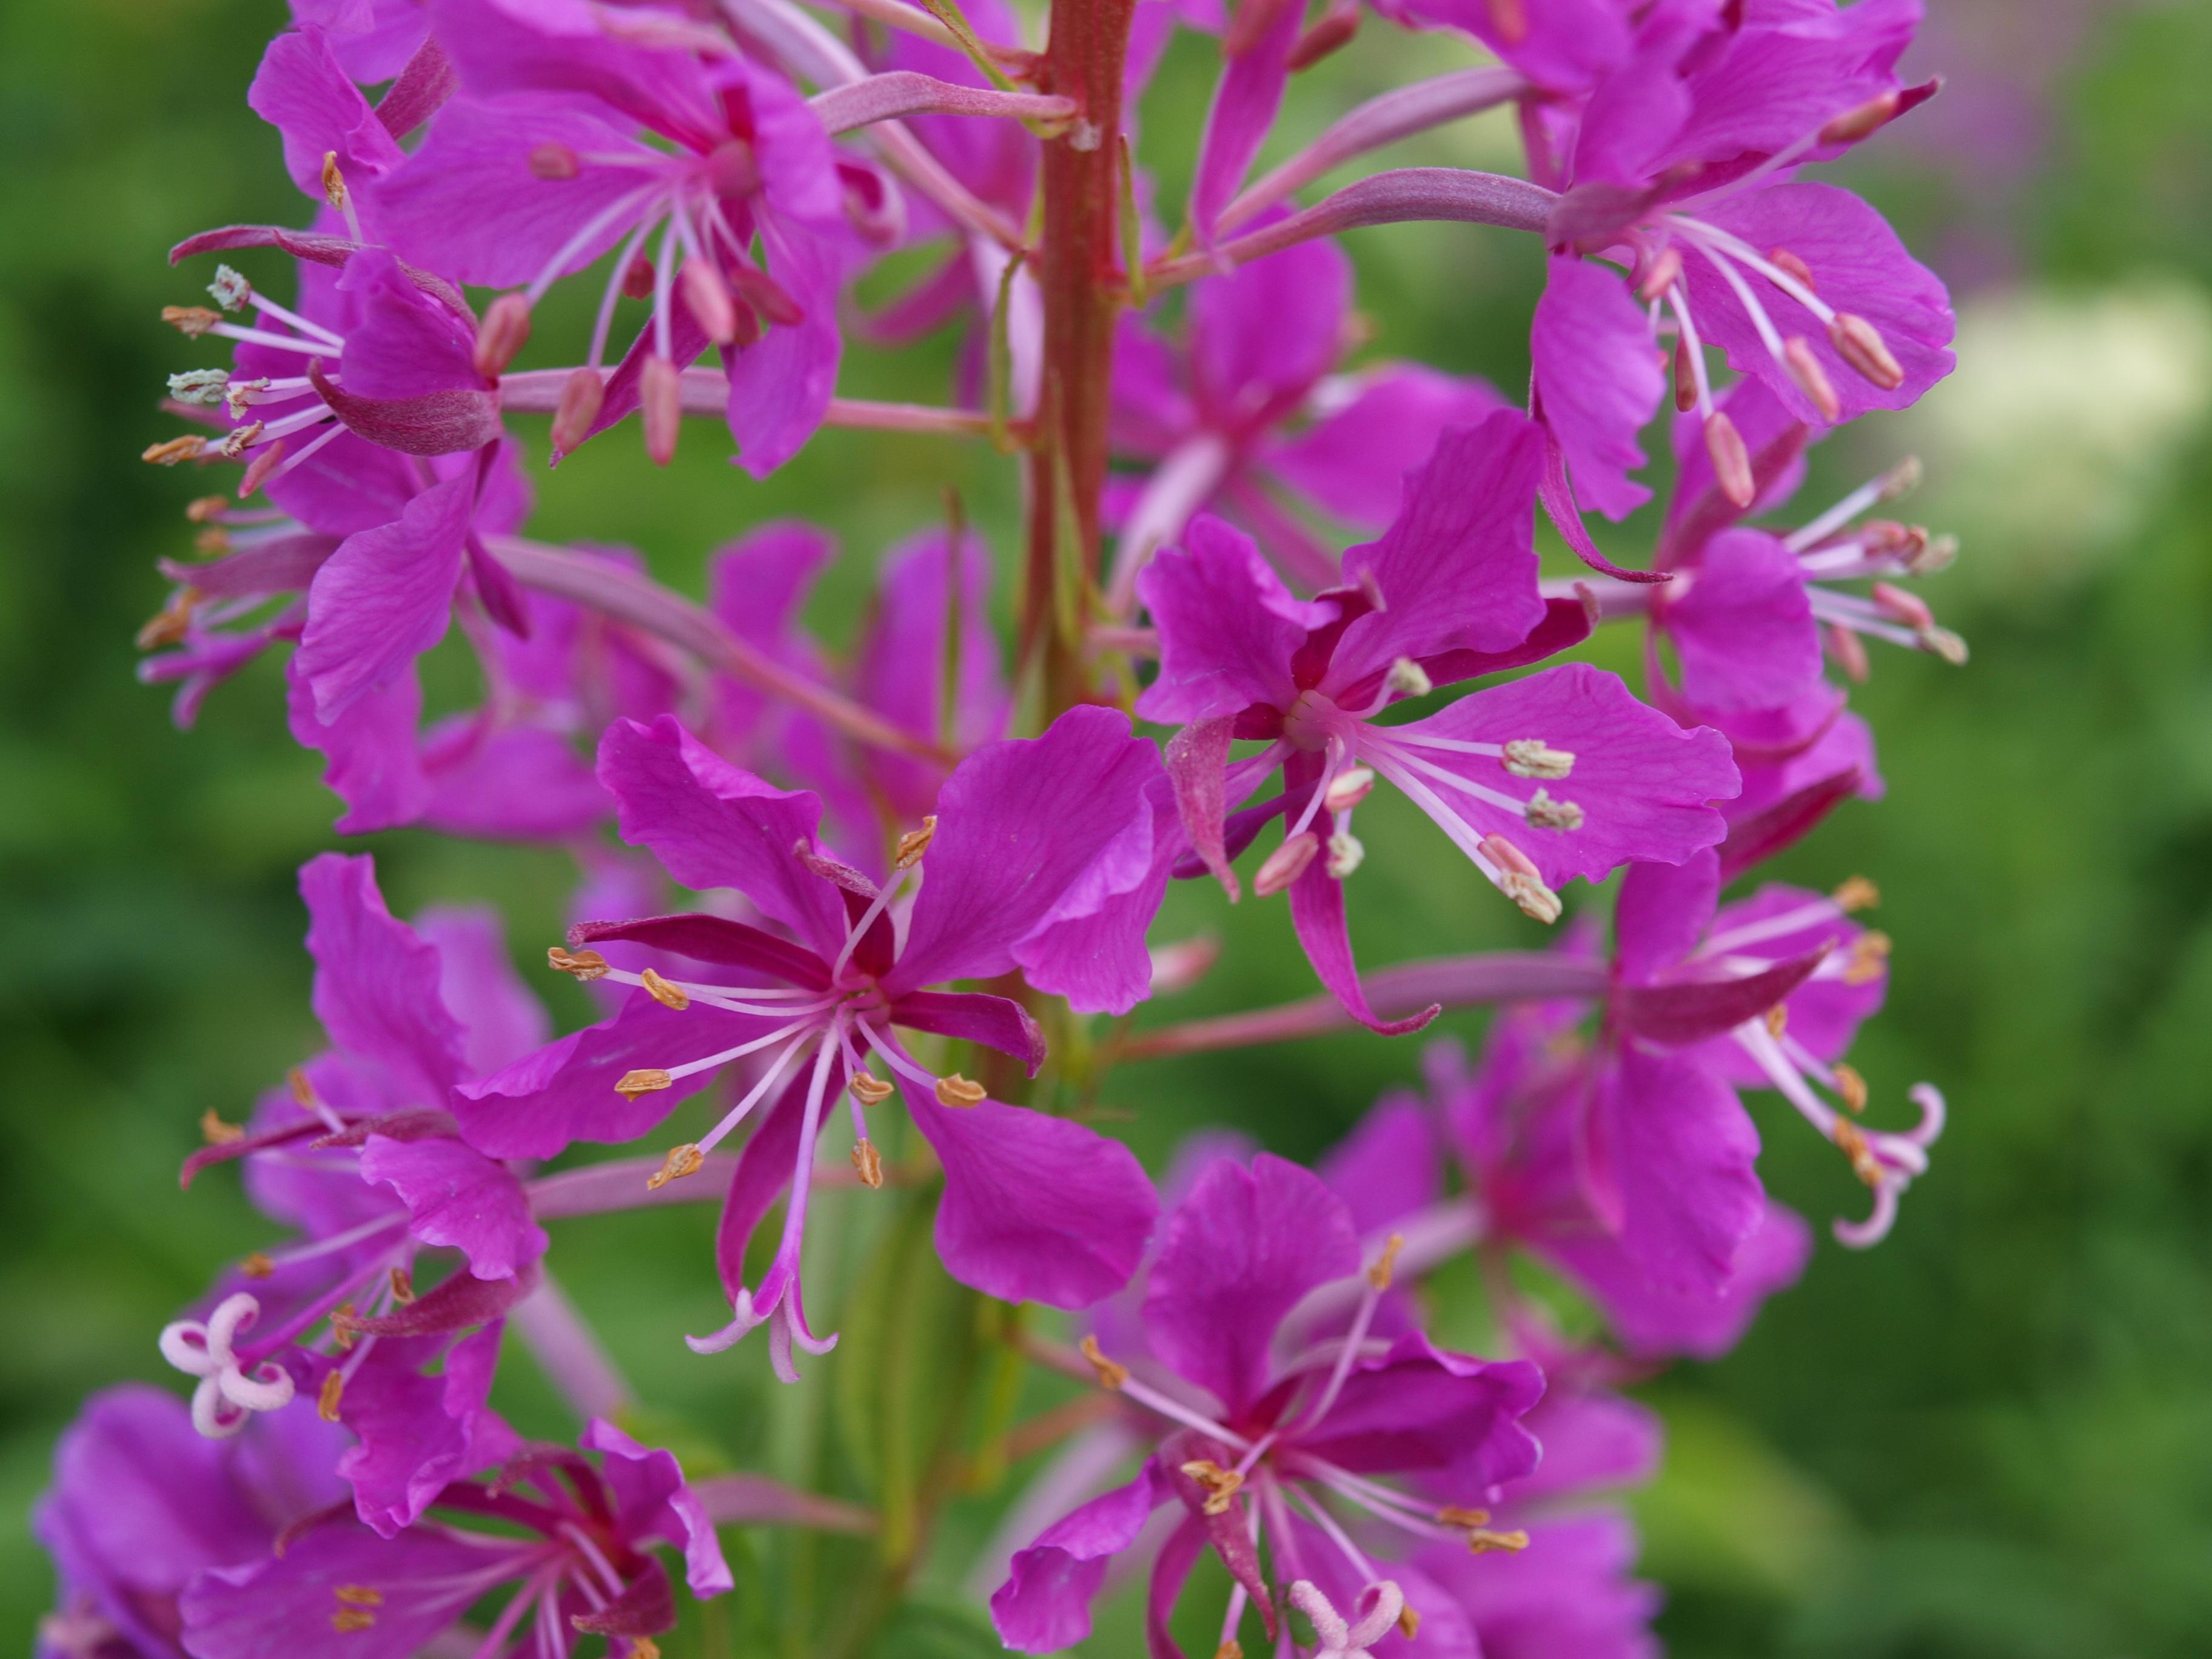 Free images nature blossom flower purple herb botany pink free images nature blossom flower purple herb botany pink flora wildflower shrub flowering plant evening primrose greenhouse dhlflorist Choice Image